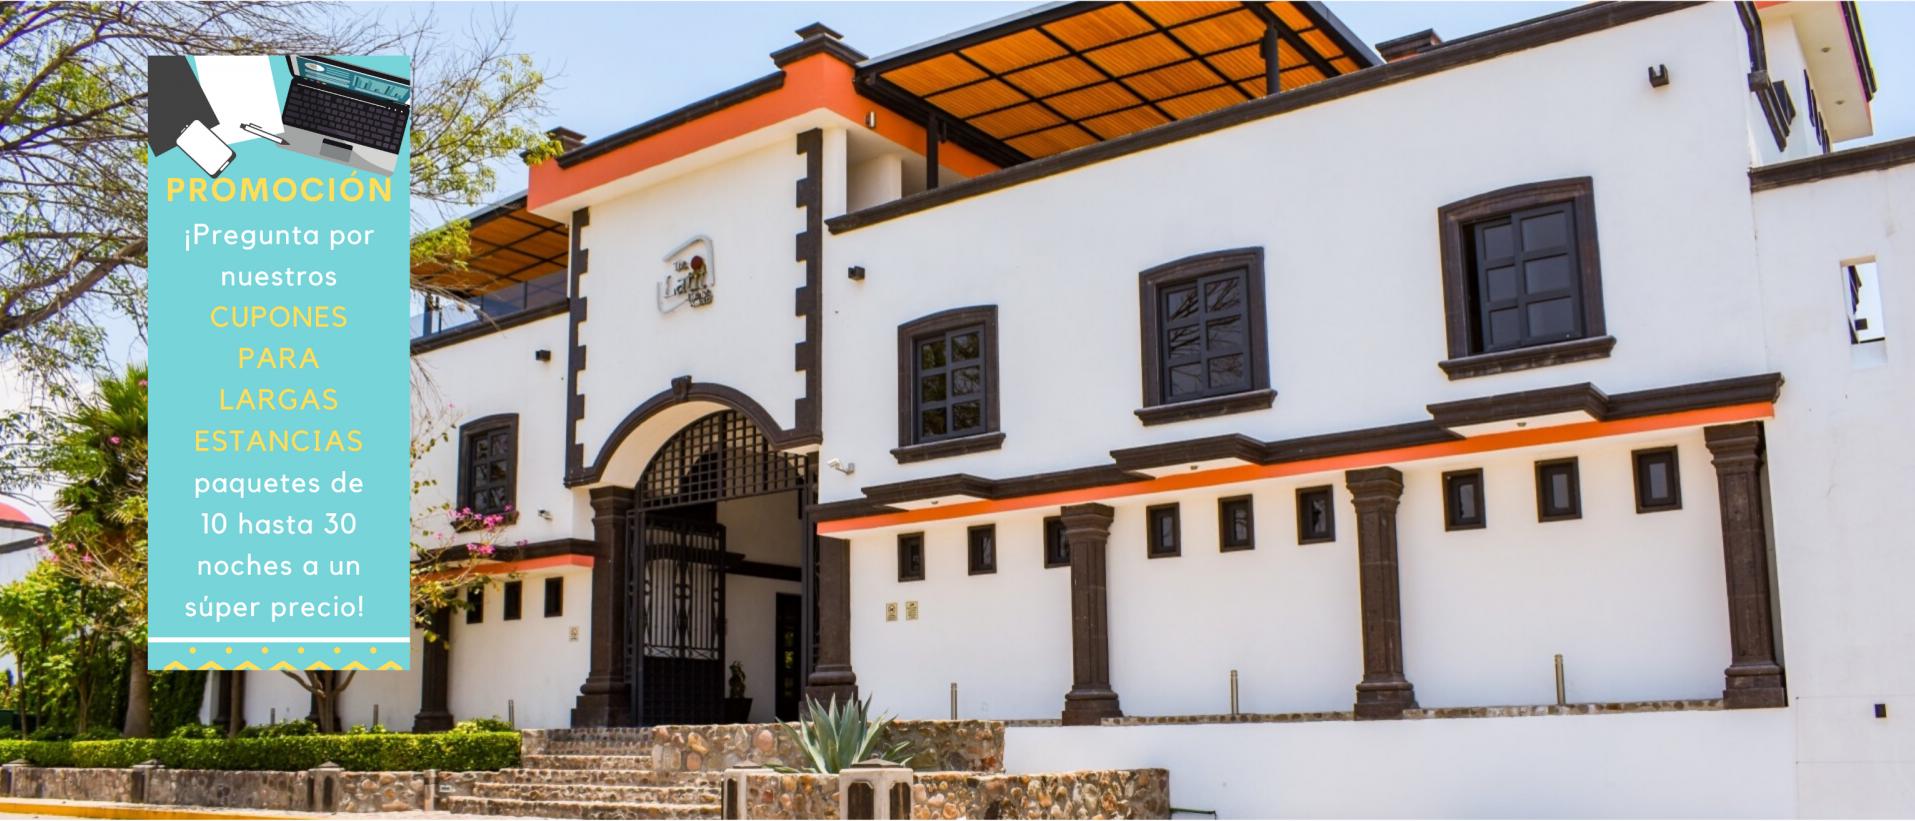 The Latit Hotel Querétaro